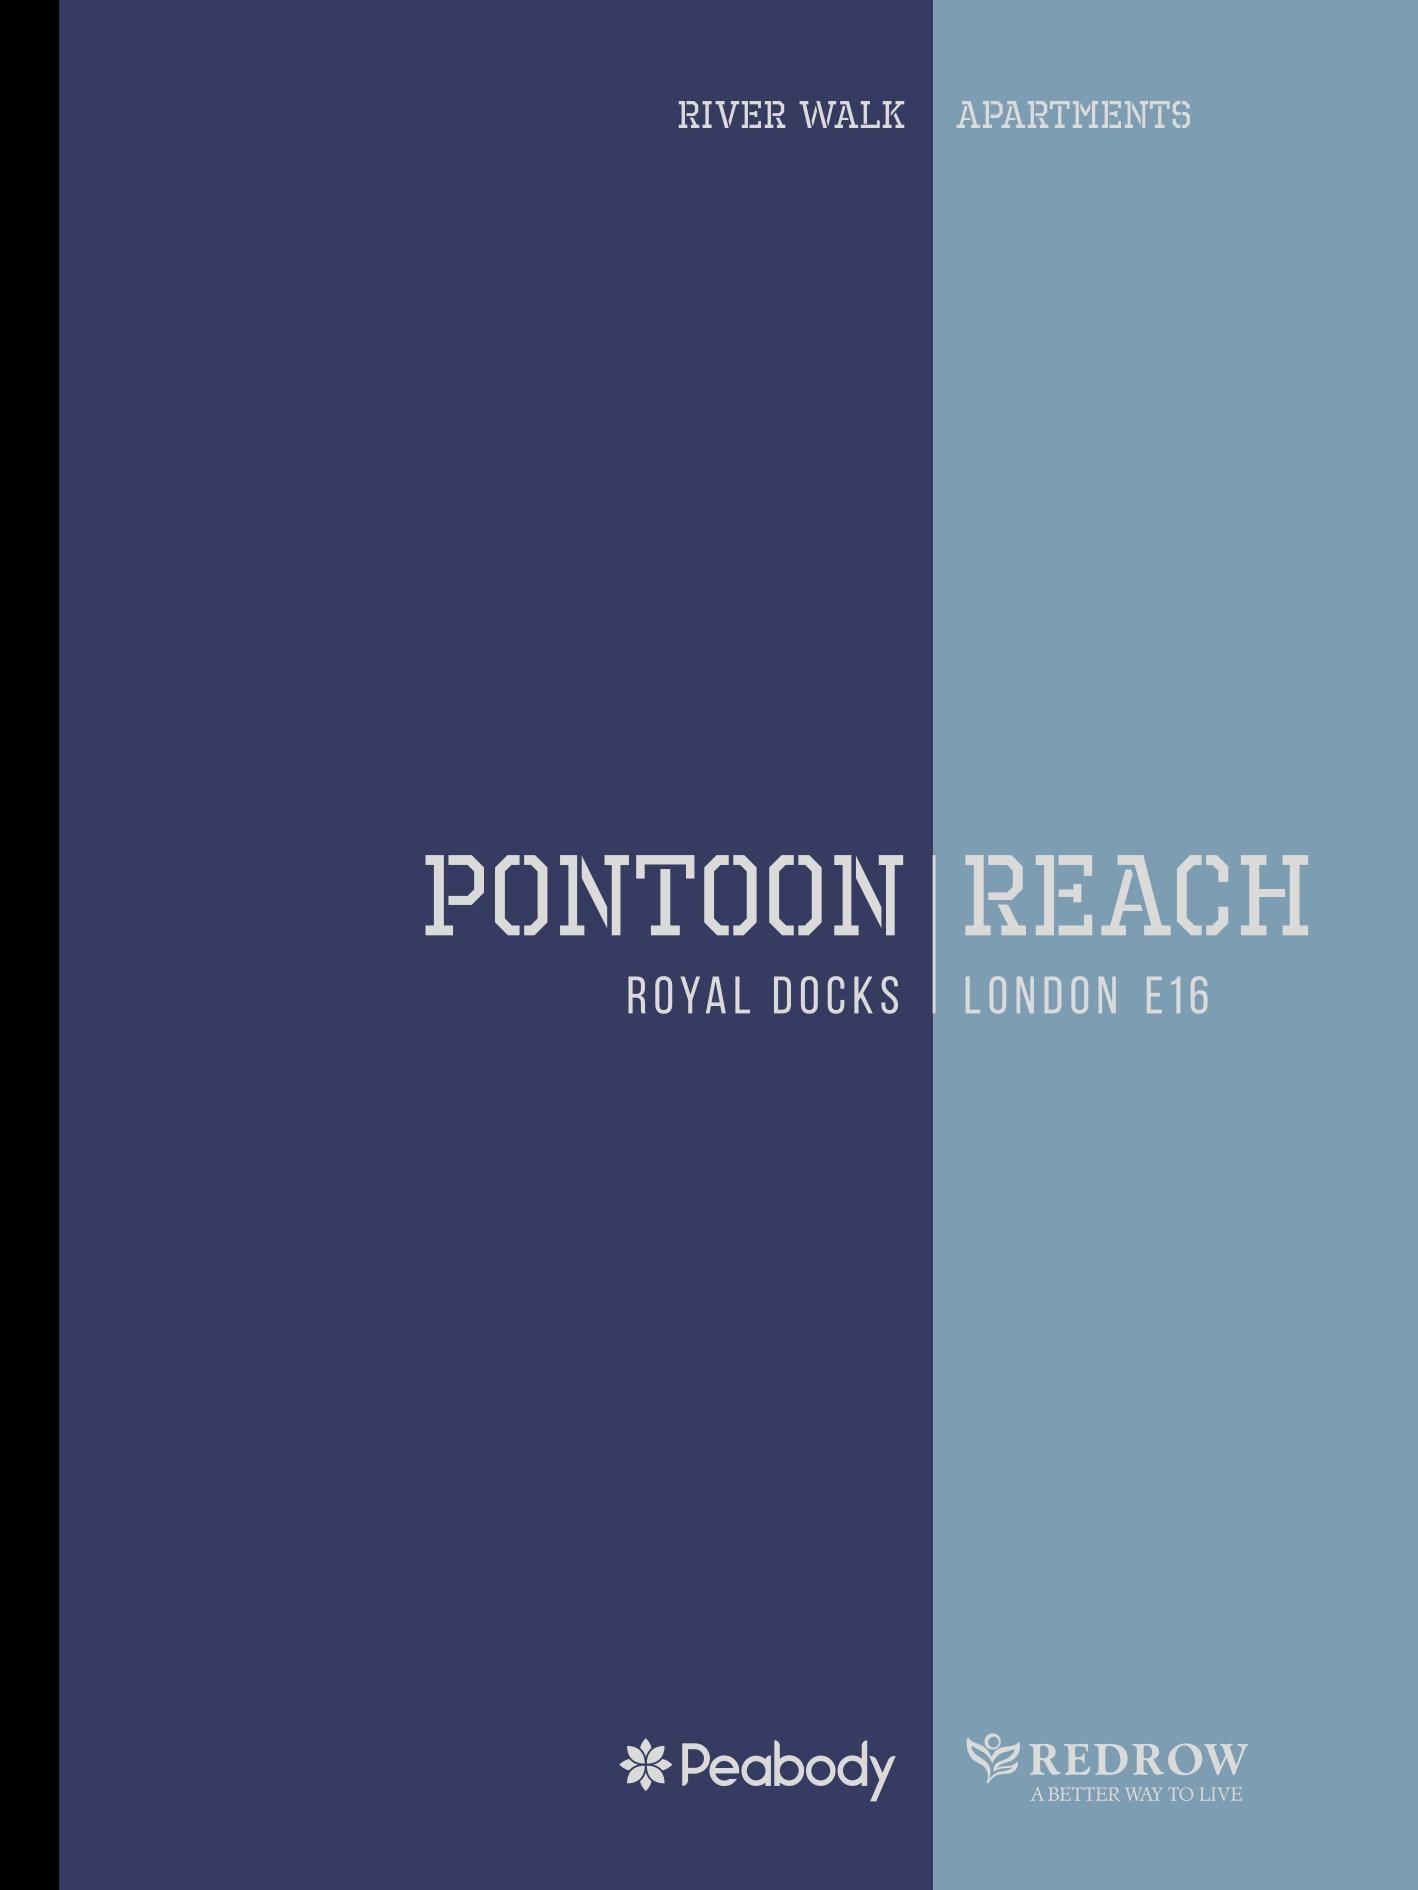 Pontoon_Reach_River_Walk_brochure_Front